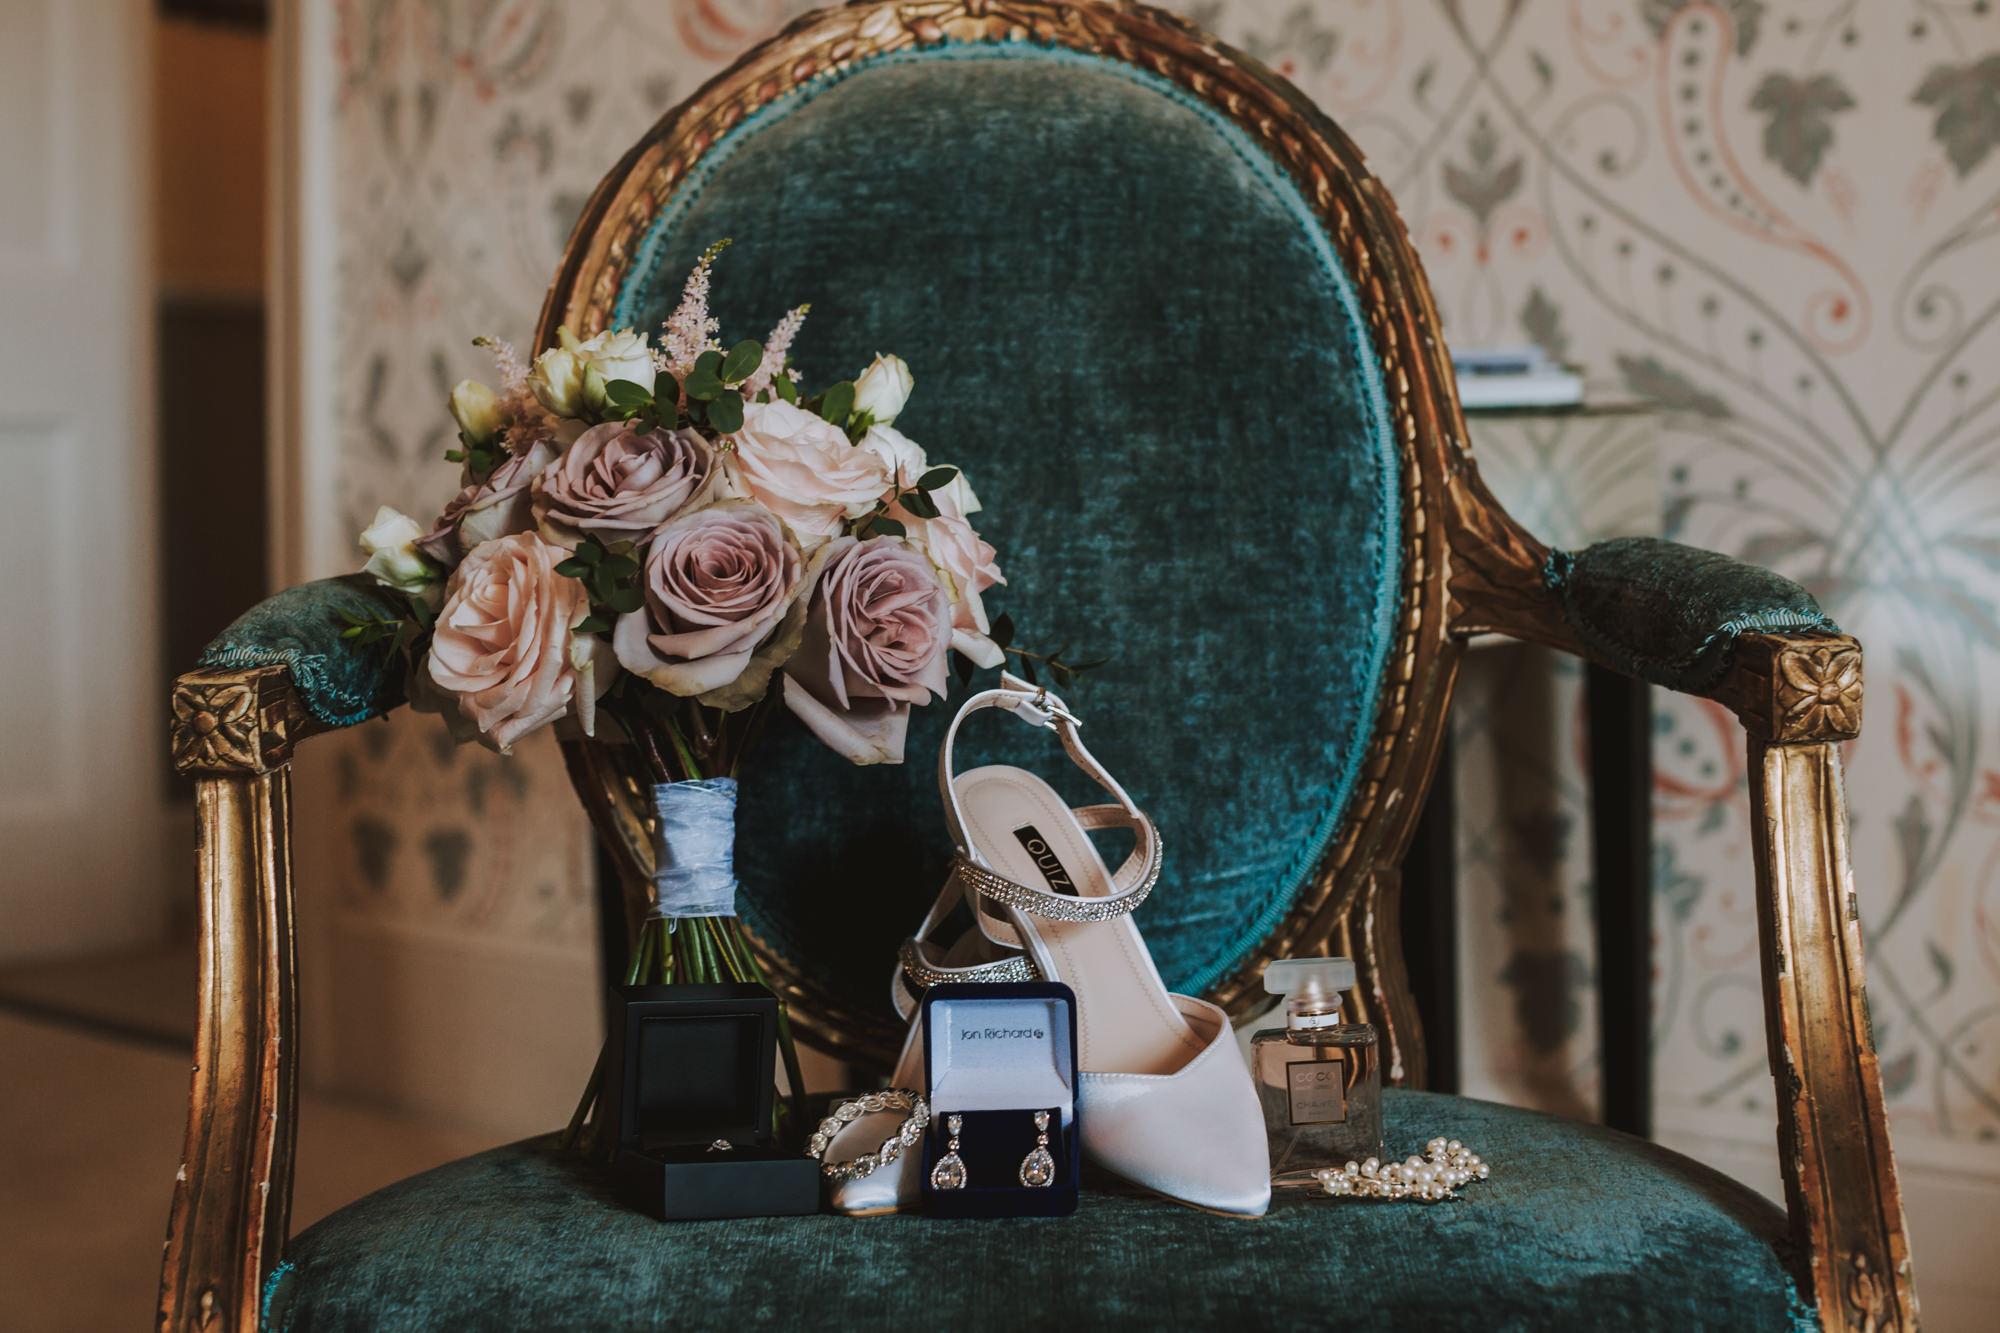 hodsock priory wedding photographers blog10.jpg